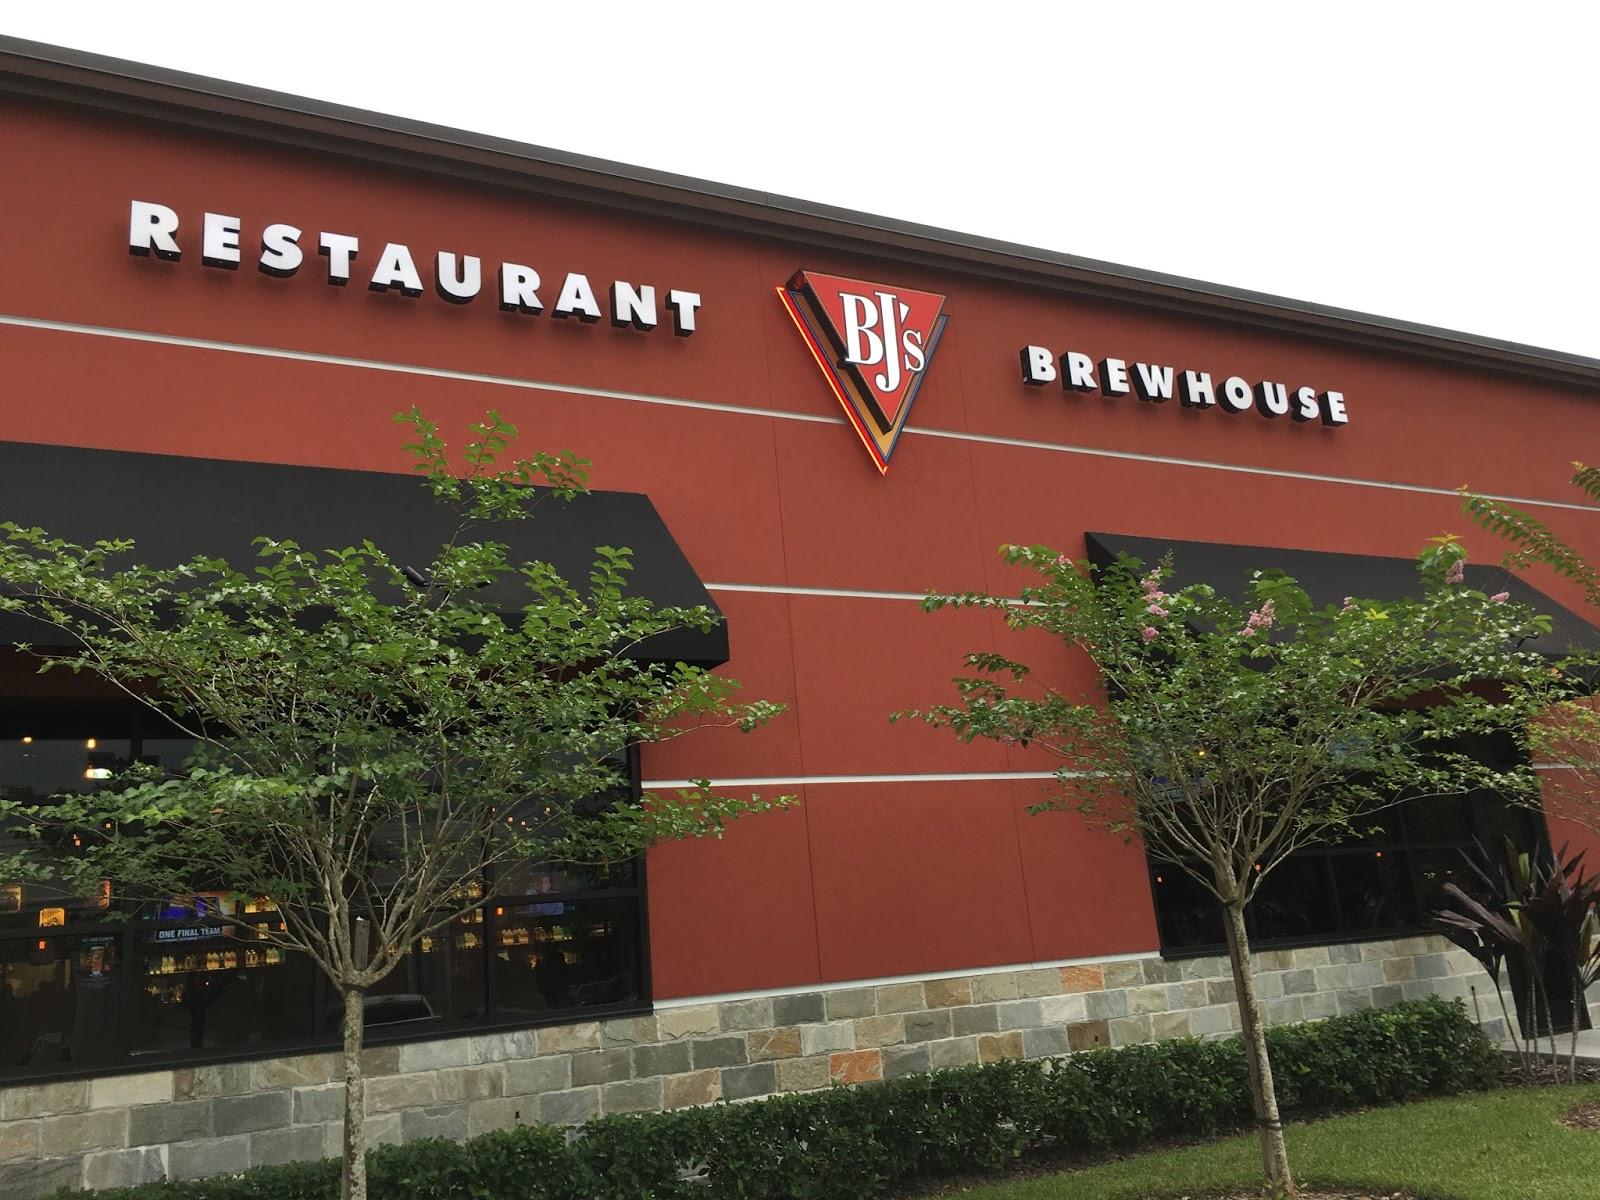 Alexis S Gluten Free Adventures Bj Restaurant Brewhouse